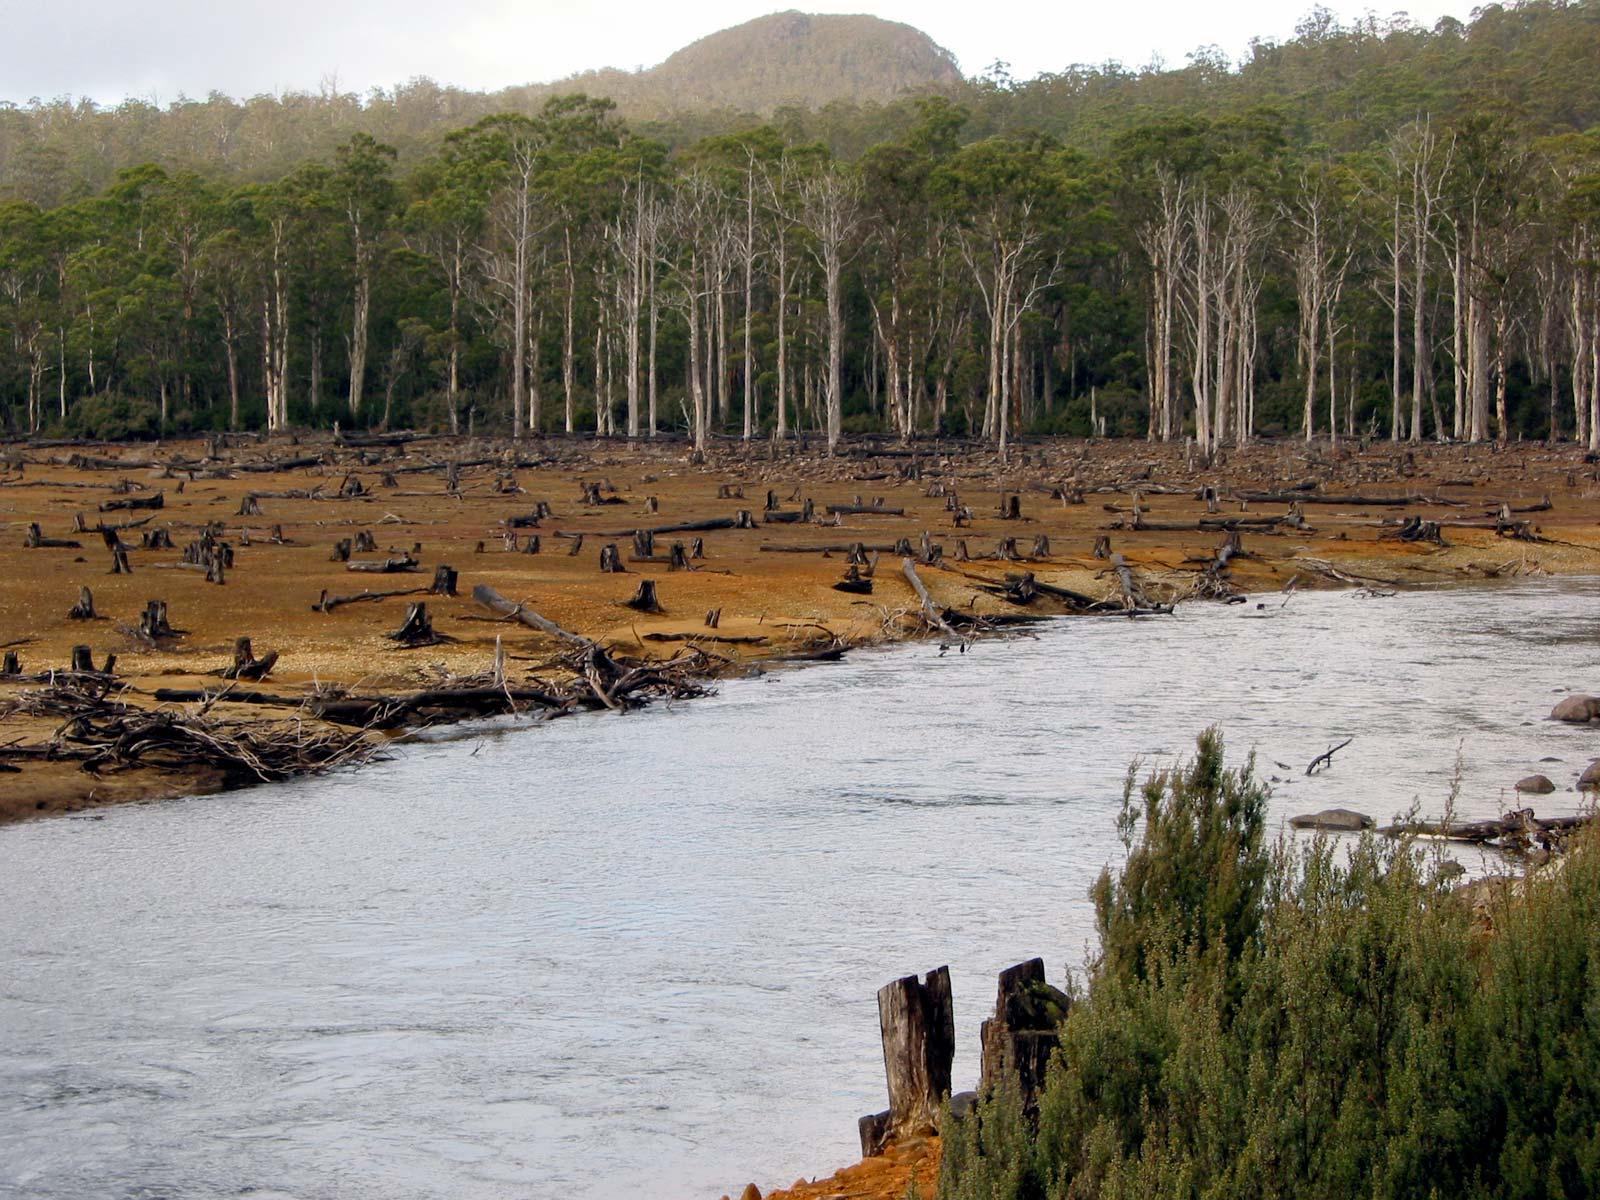 Habitat Fragmentation Increases Biodiversity Decline